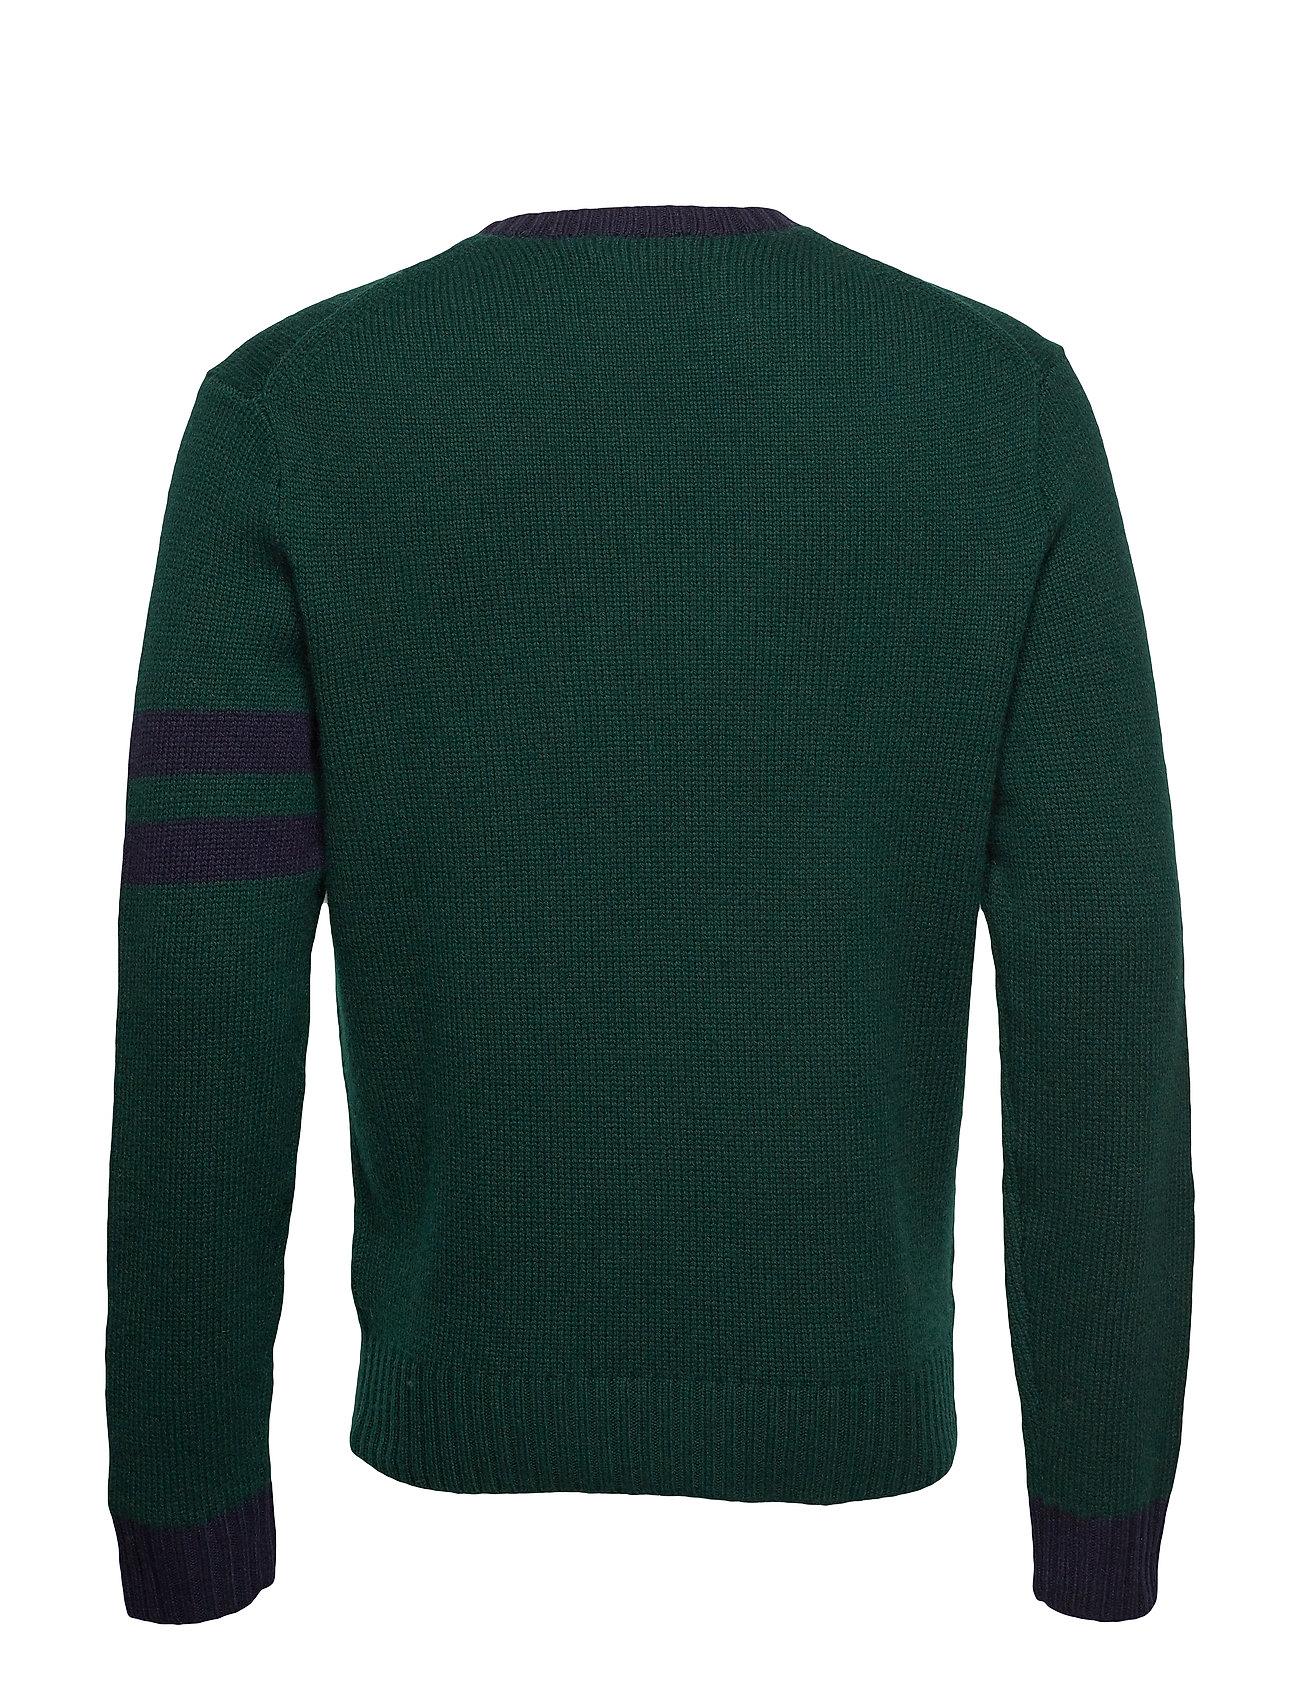 St Lauren long Sleeve sweaterforrest Ralph AndrewPolo Ls Cn 80wNZnOPkX